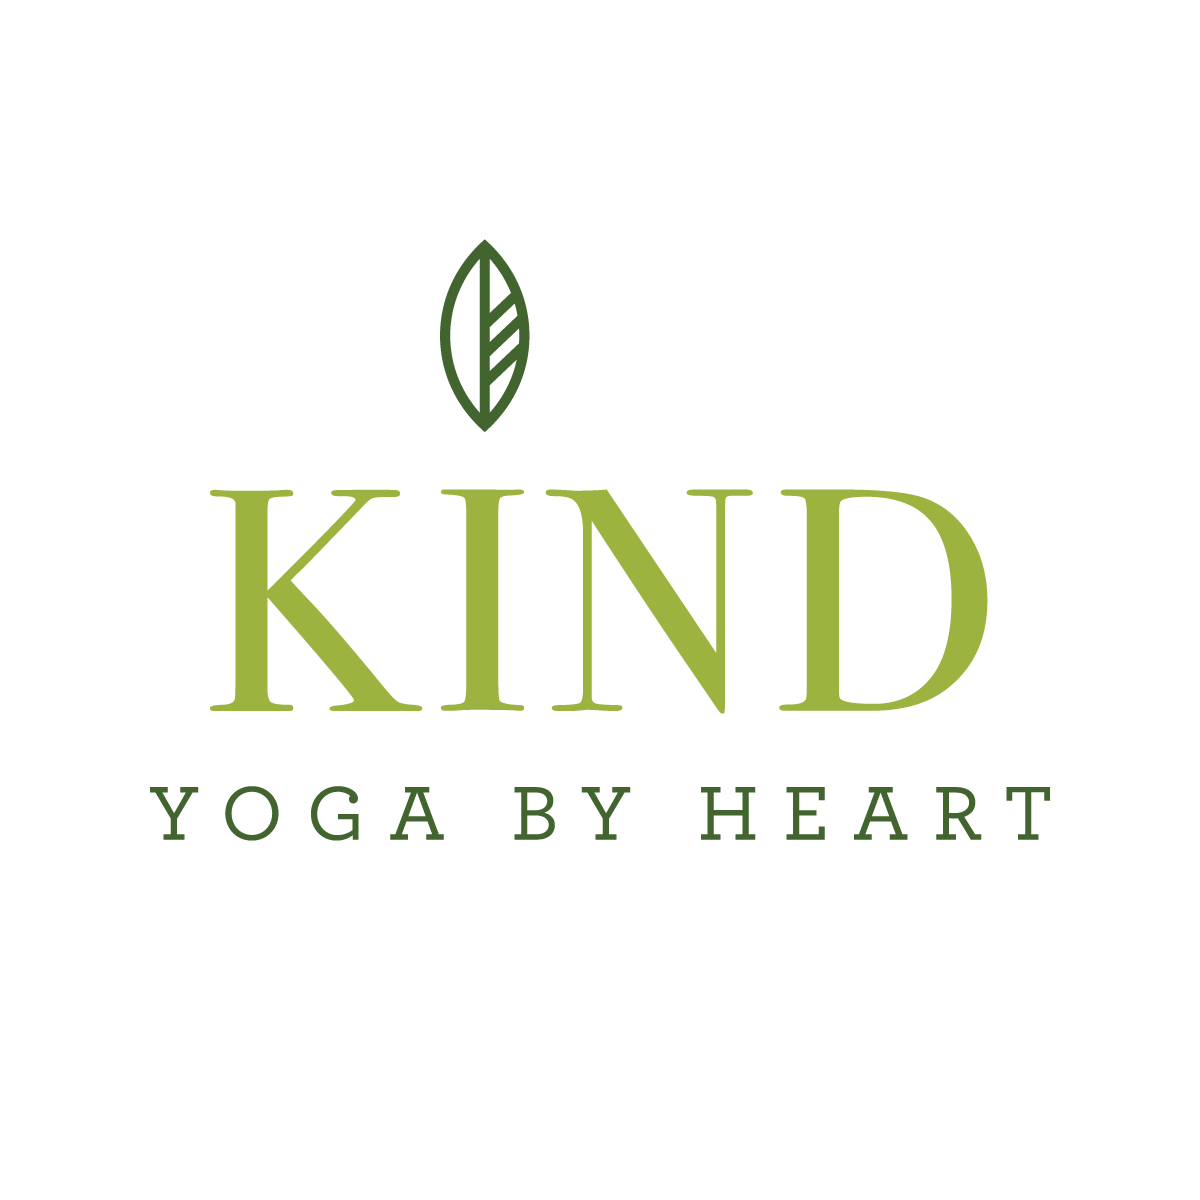 Kind Yoga By Heart Logo